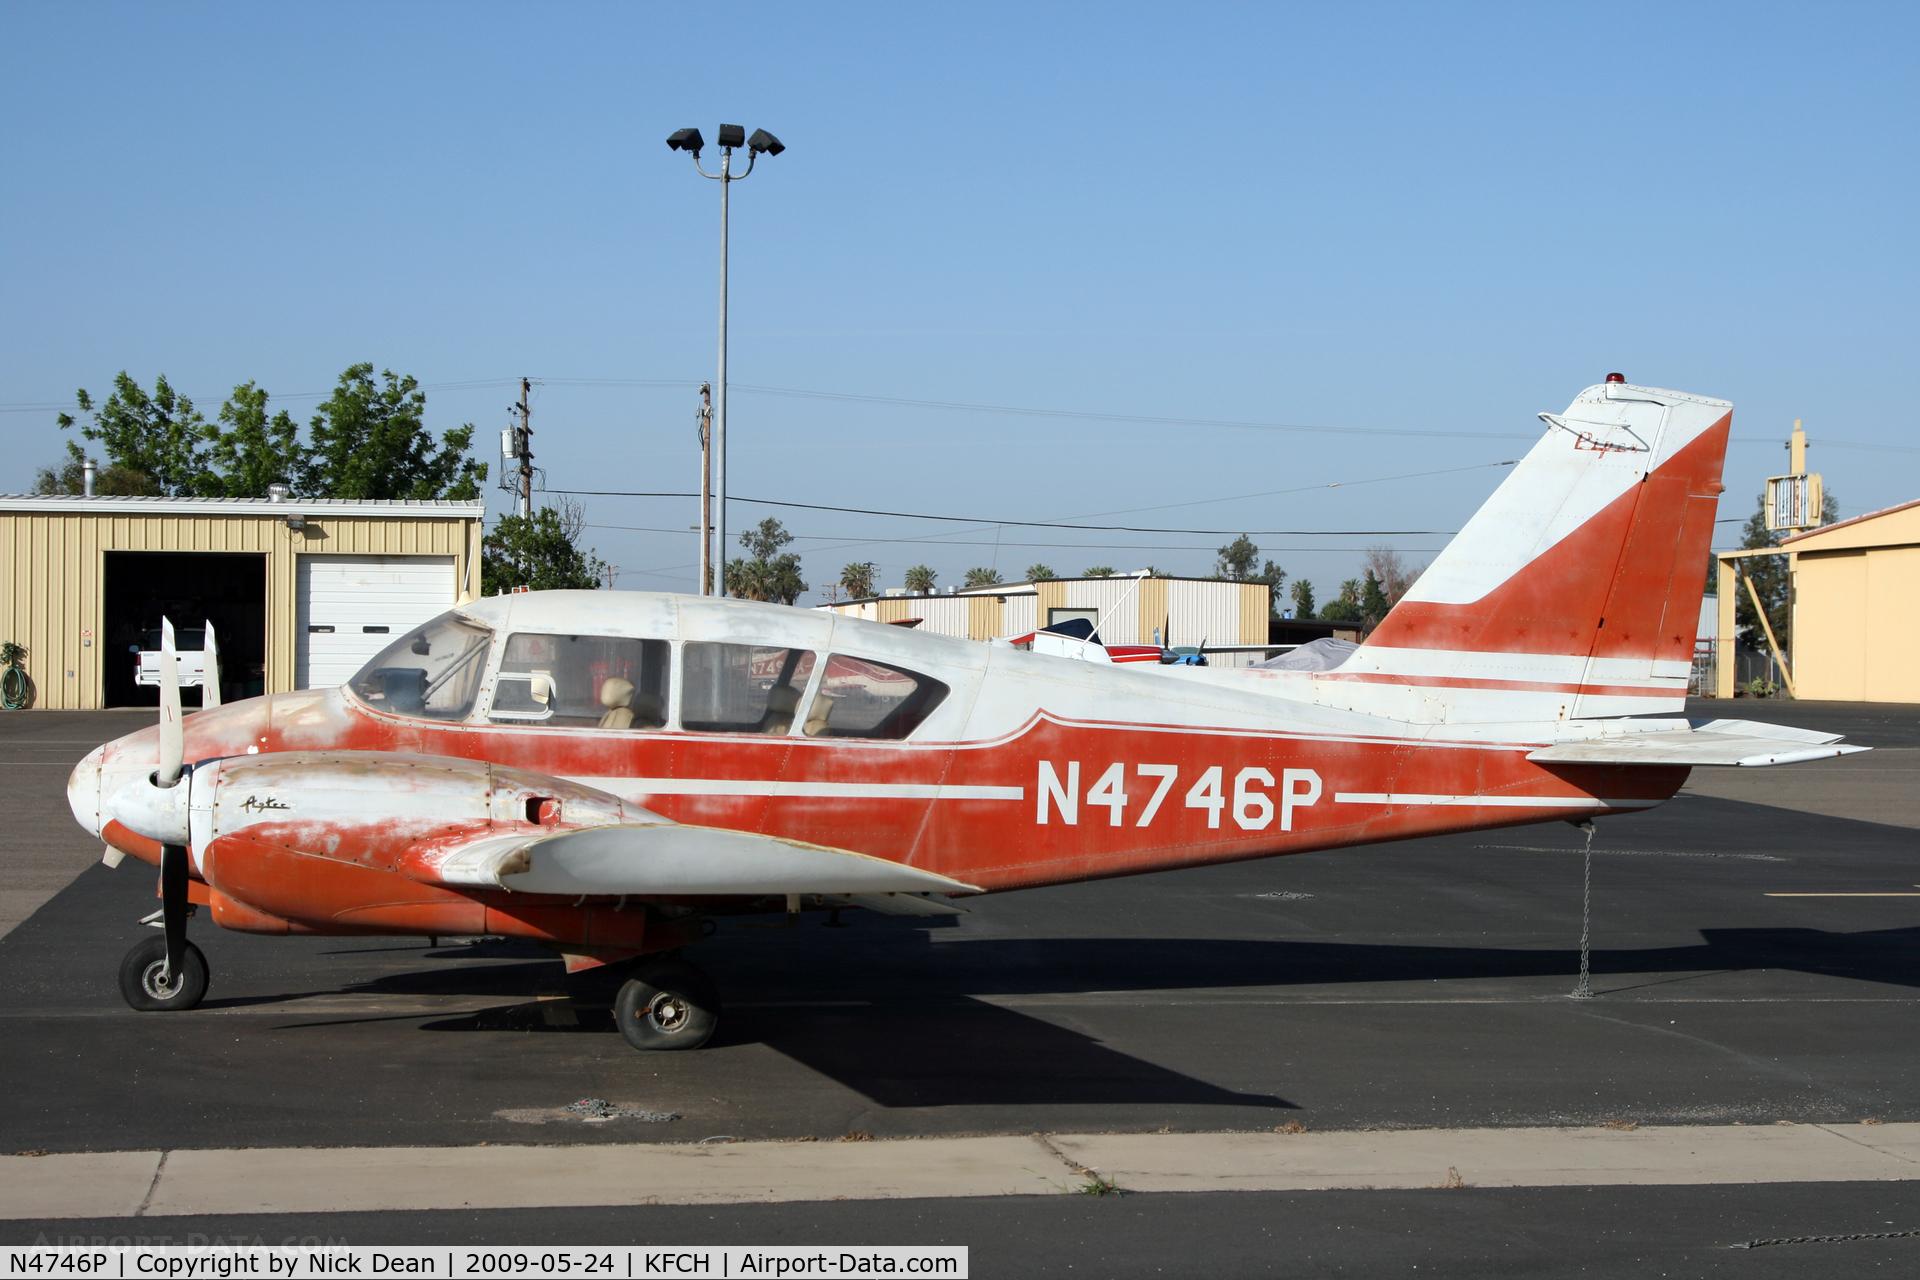 N4746P, 1960 Piper PA-23-250 C/N 27-282, KFCH